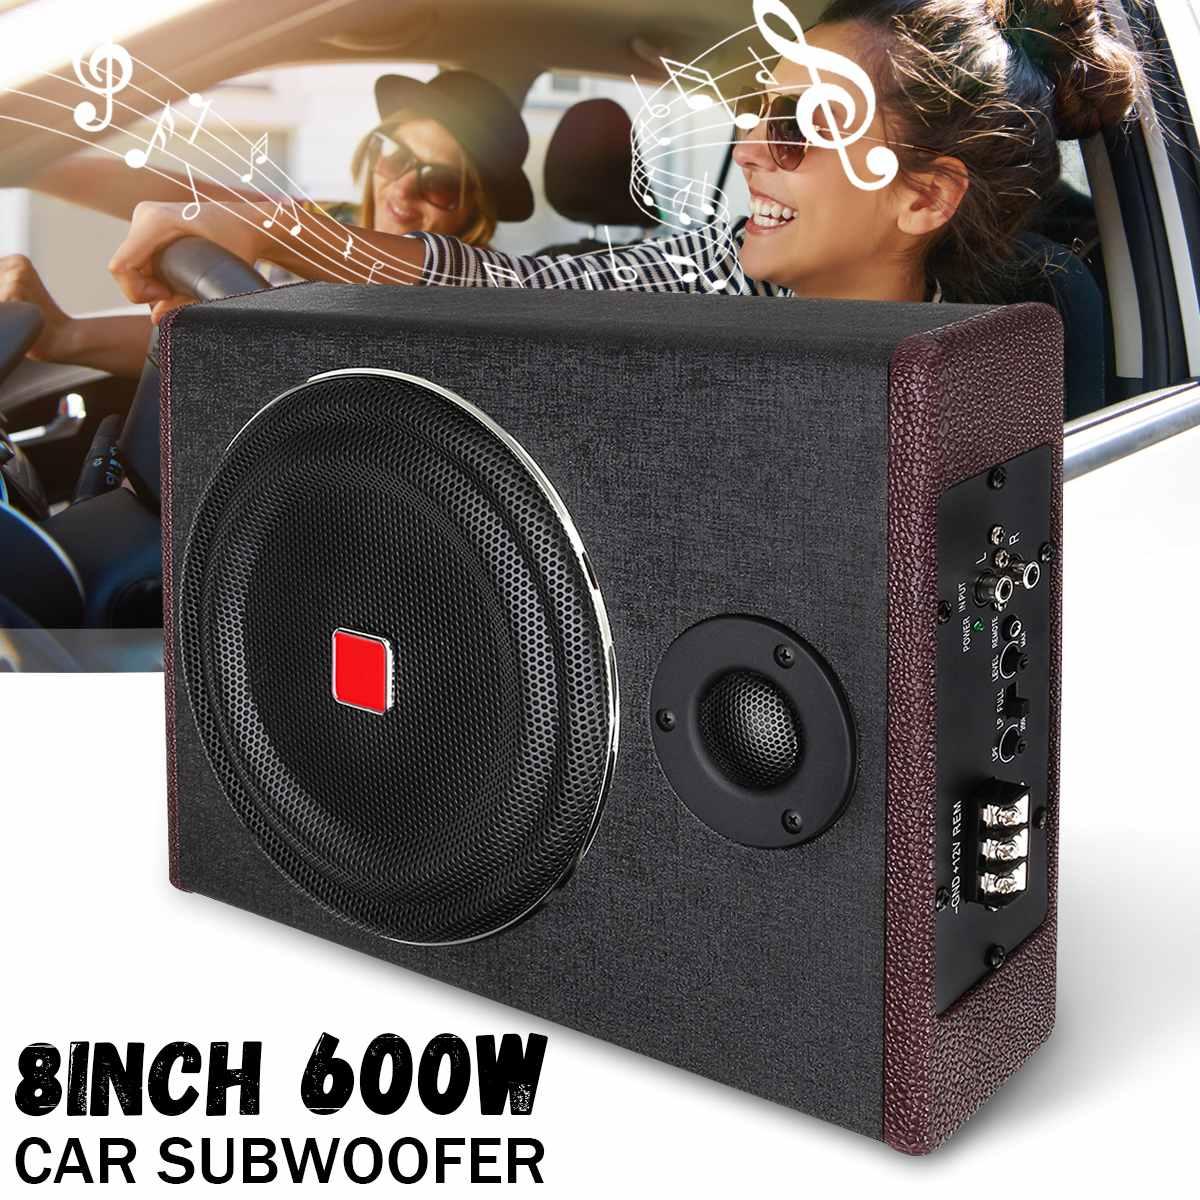 Car-Amplifier Speaker Sub Subwoofers Under-Seat Active Slim Super-Bass 600W 8inch